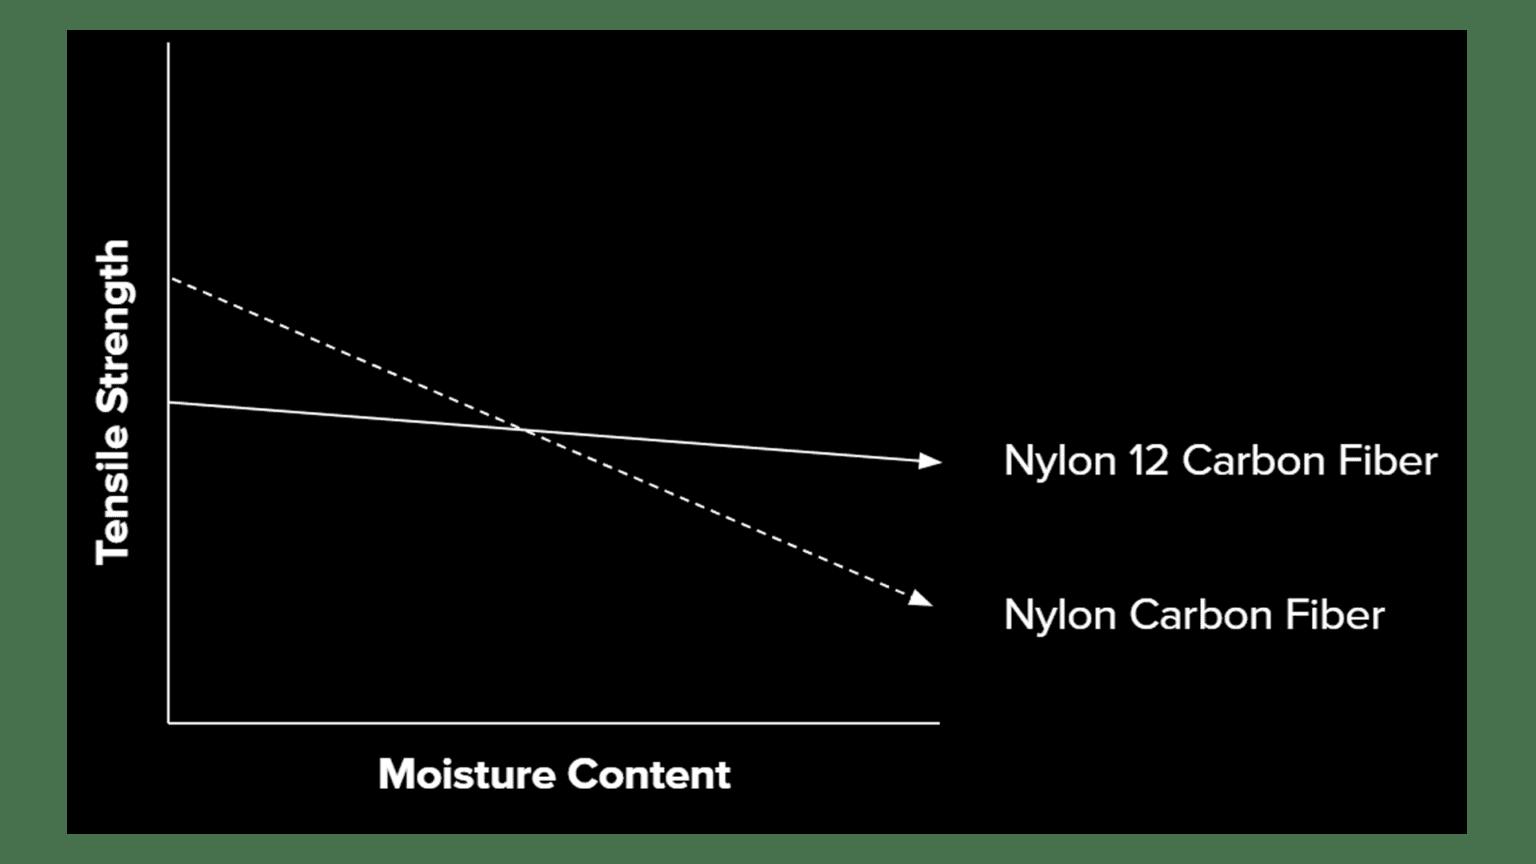 N6-vs-N12-Humidity-chart-1536x864